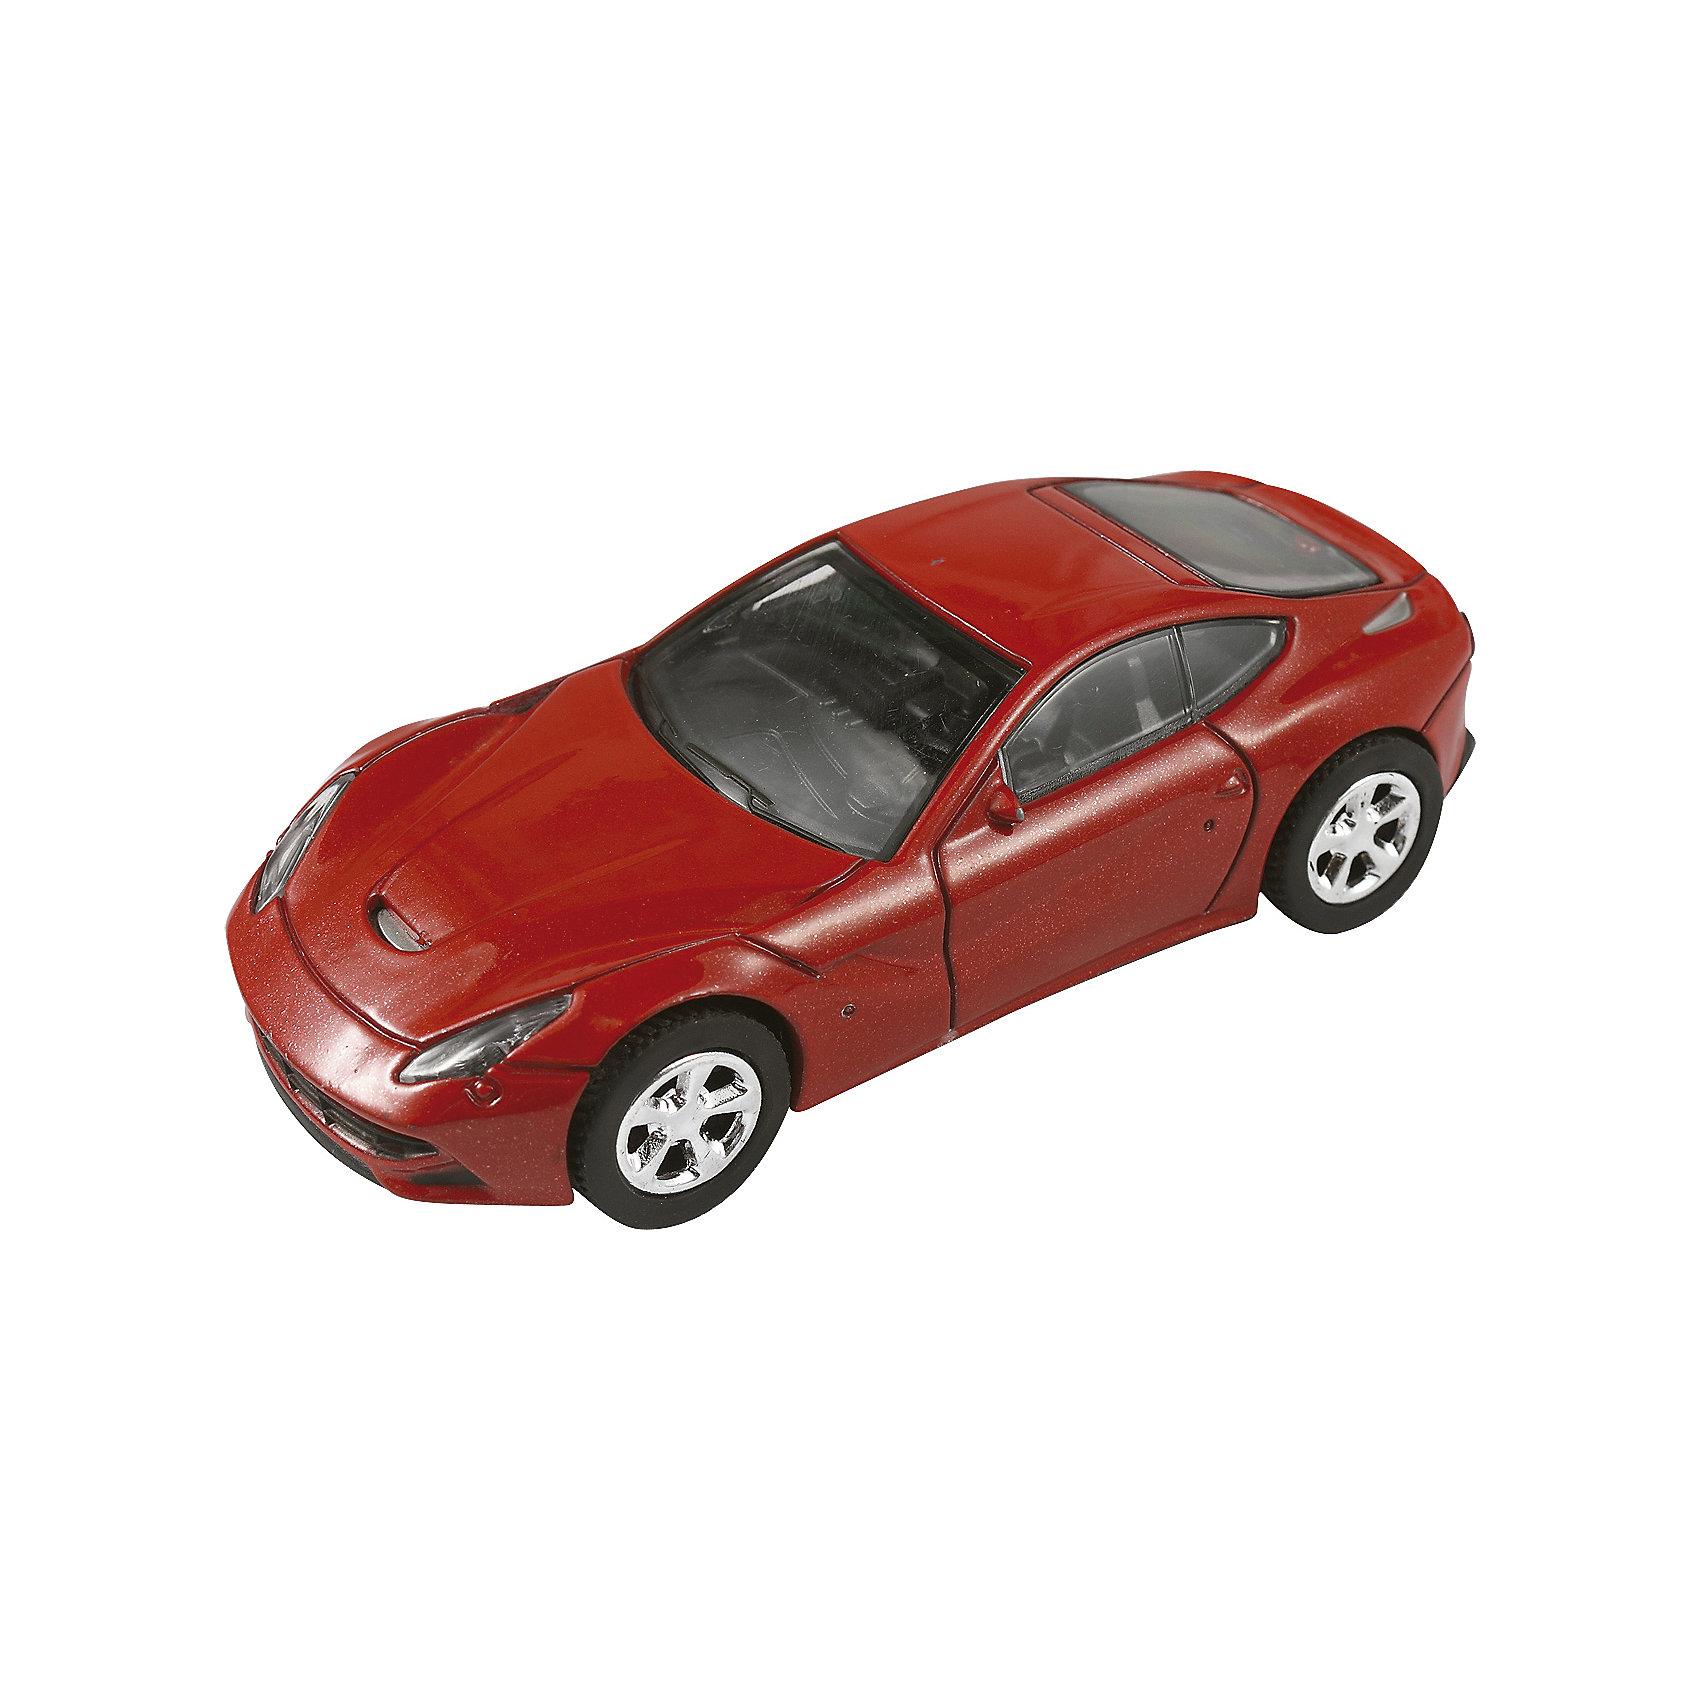 Машинка Japan Coupe Prestige со светом фар 1:43, AutotimeМашинки<br><br><br>Ширина мм: 165<br>Глубина мм: 57<br>Высота мм: 75<br>Вес г: 13<br>Возраст от месяцев: 36<br>Возраст до месяцев: 2147483647<br>Пол: Мужской<br>Возраст: Детский<br>SKU: 5584037